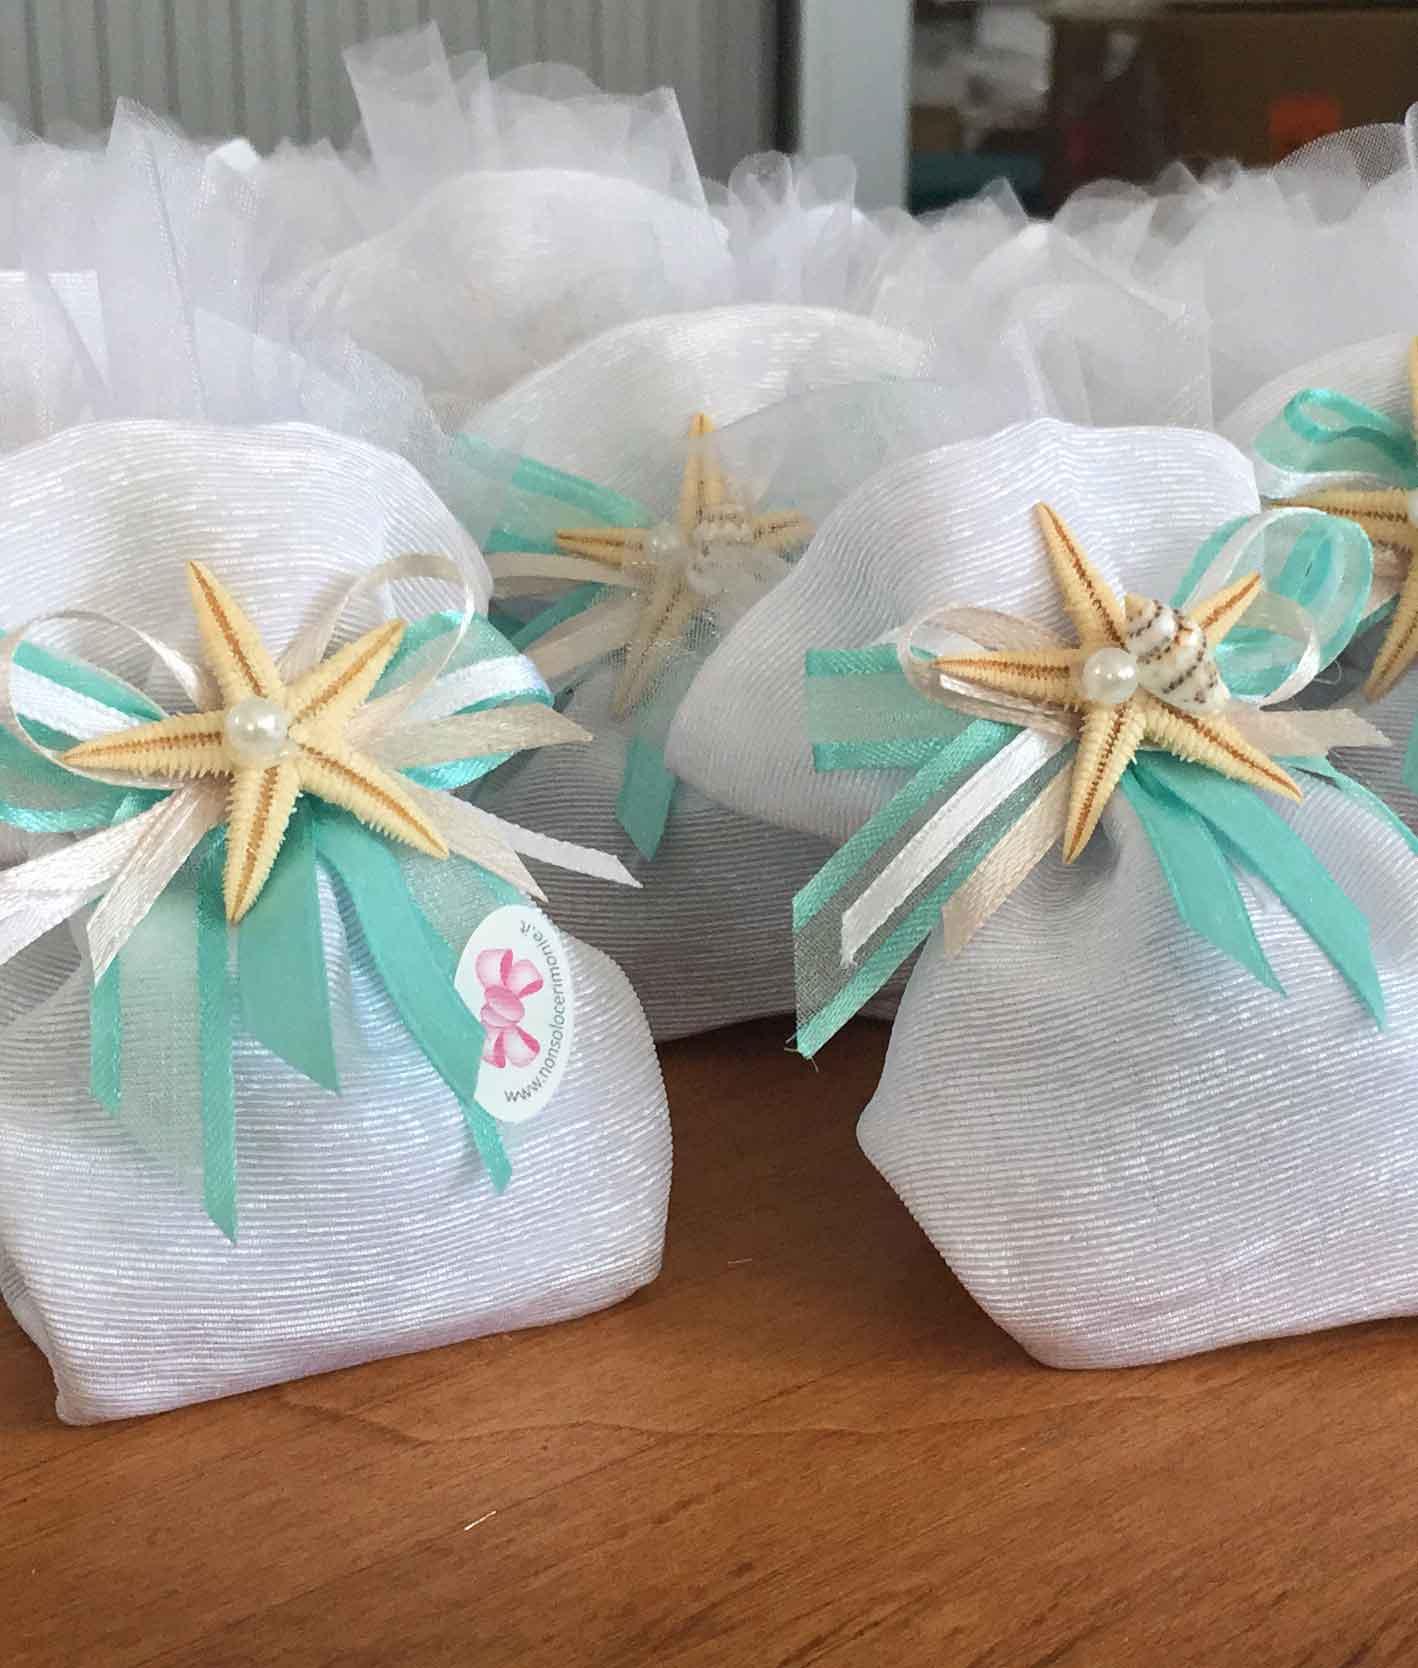 Bomboniere Matrimonio Verde Tiffany.Bomboniera Sacchetto Stella Marina Bianco Nonsolocerimonie It